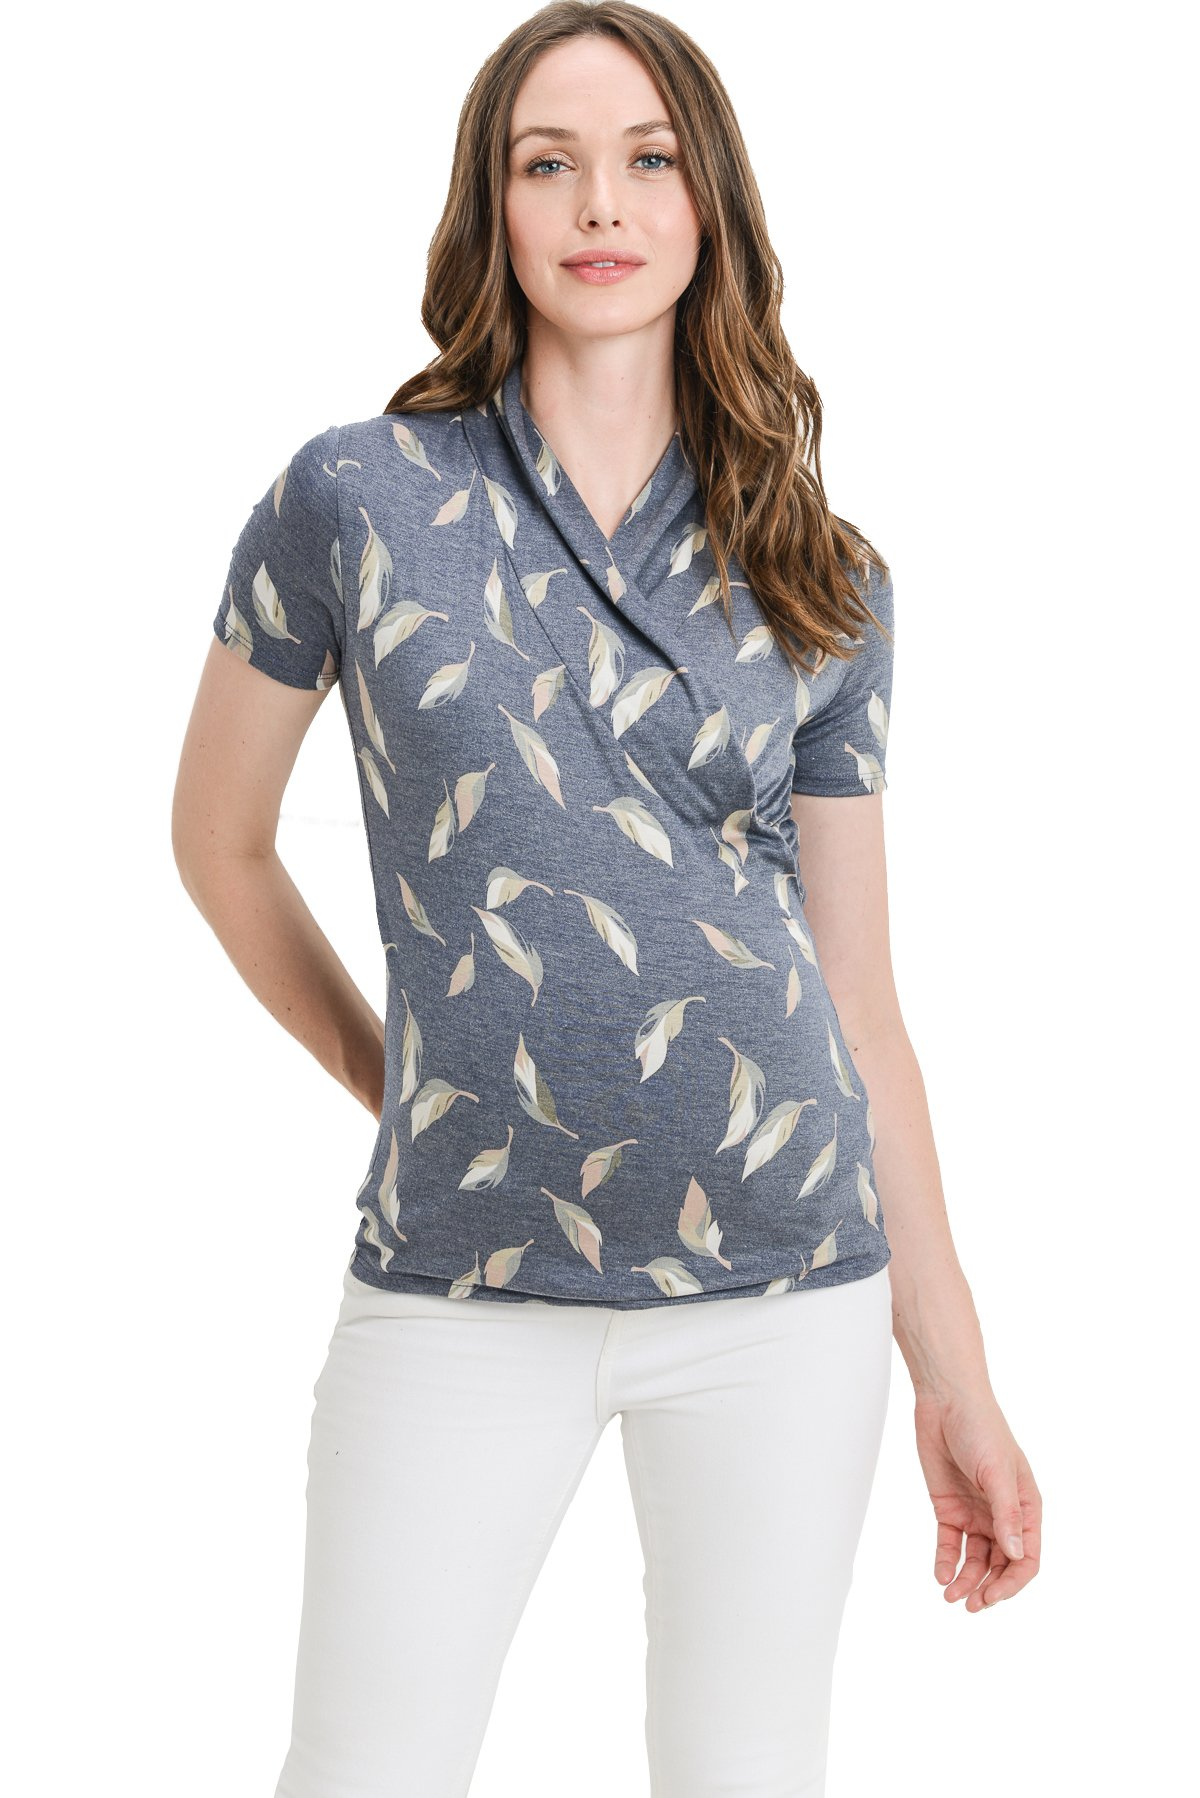 LaClef Women's Short Sleeve Surplice Maternity Nursing Top (M, Navy Leaf)